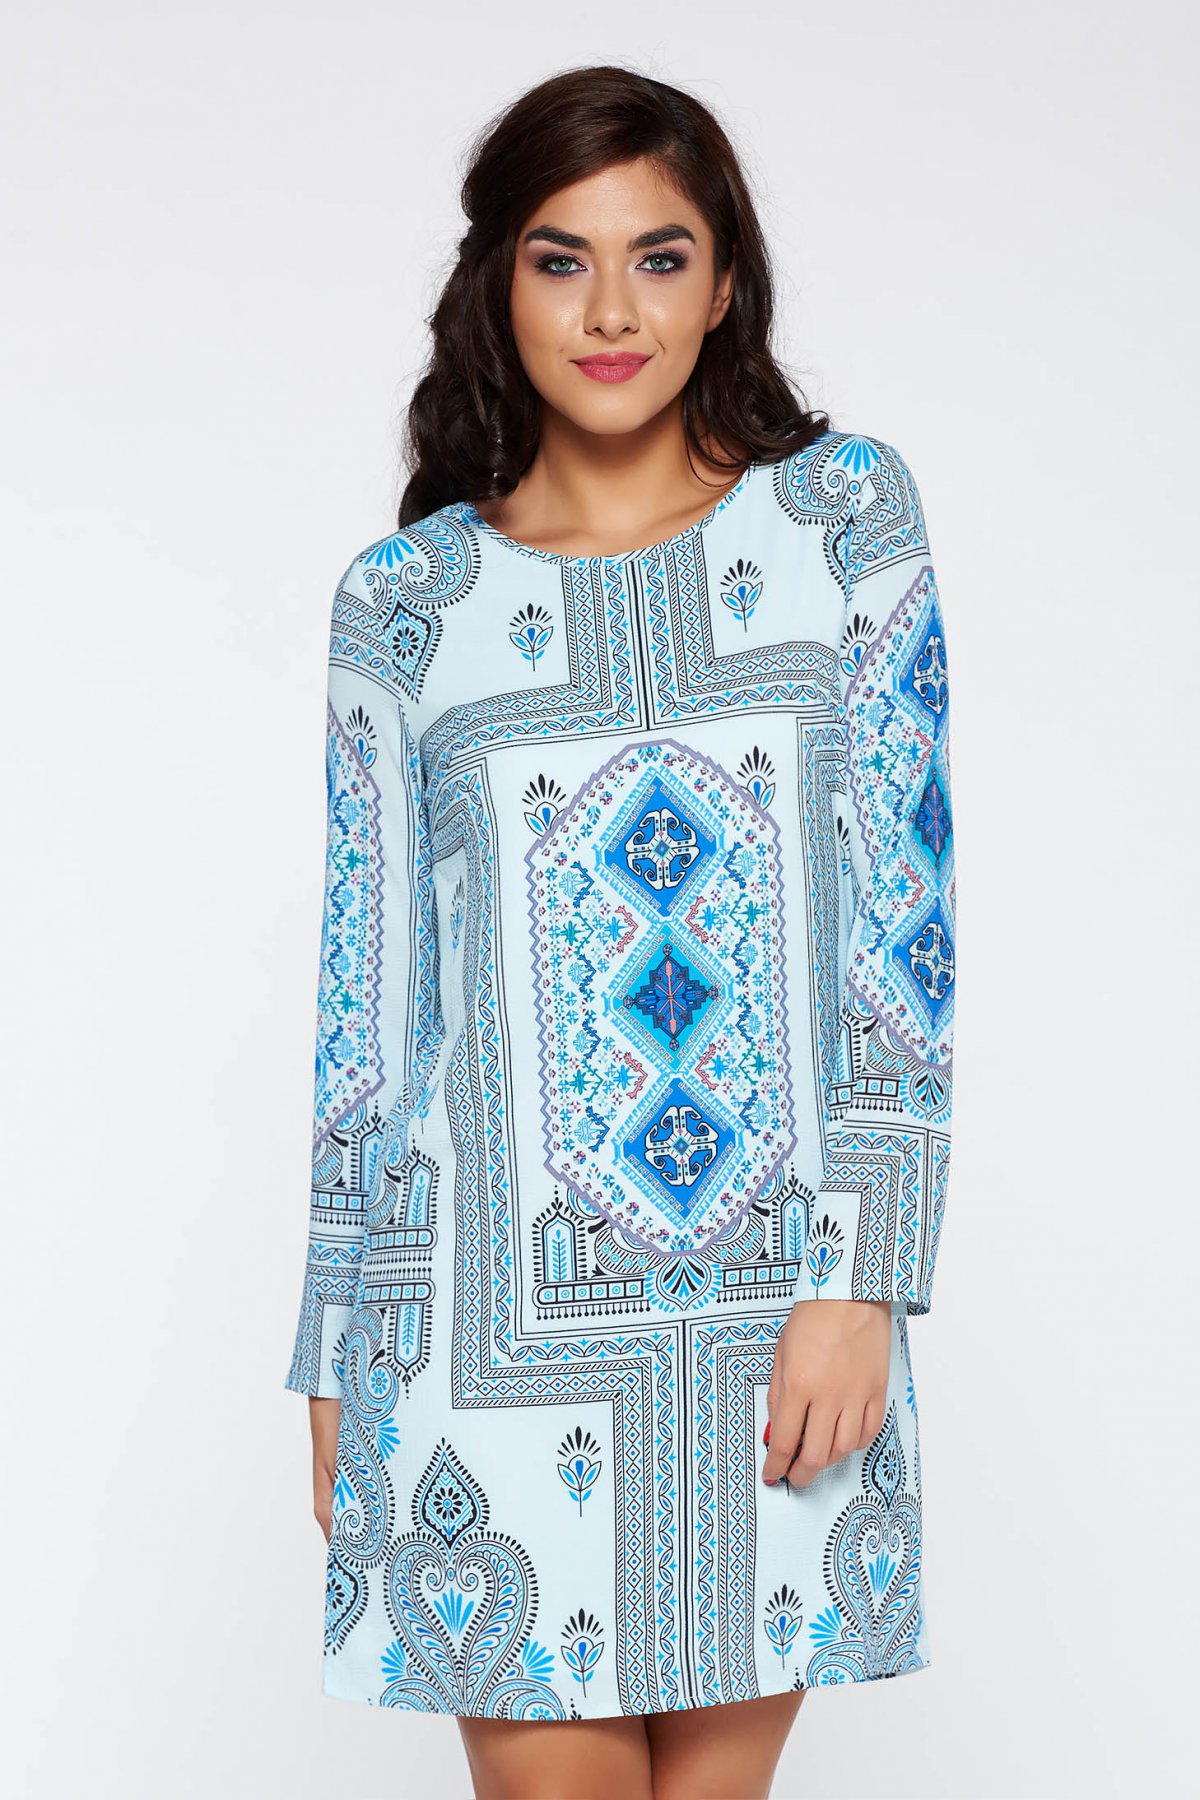 Rochie albastra casual cu maneca 3/4 cu croi larg captusita pe interior cu print